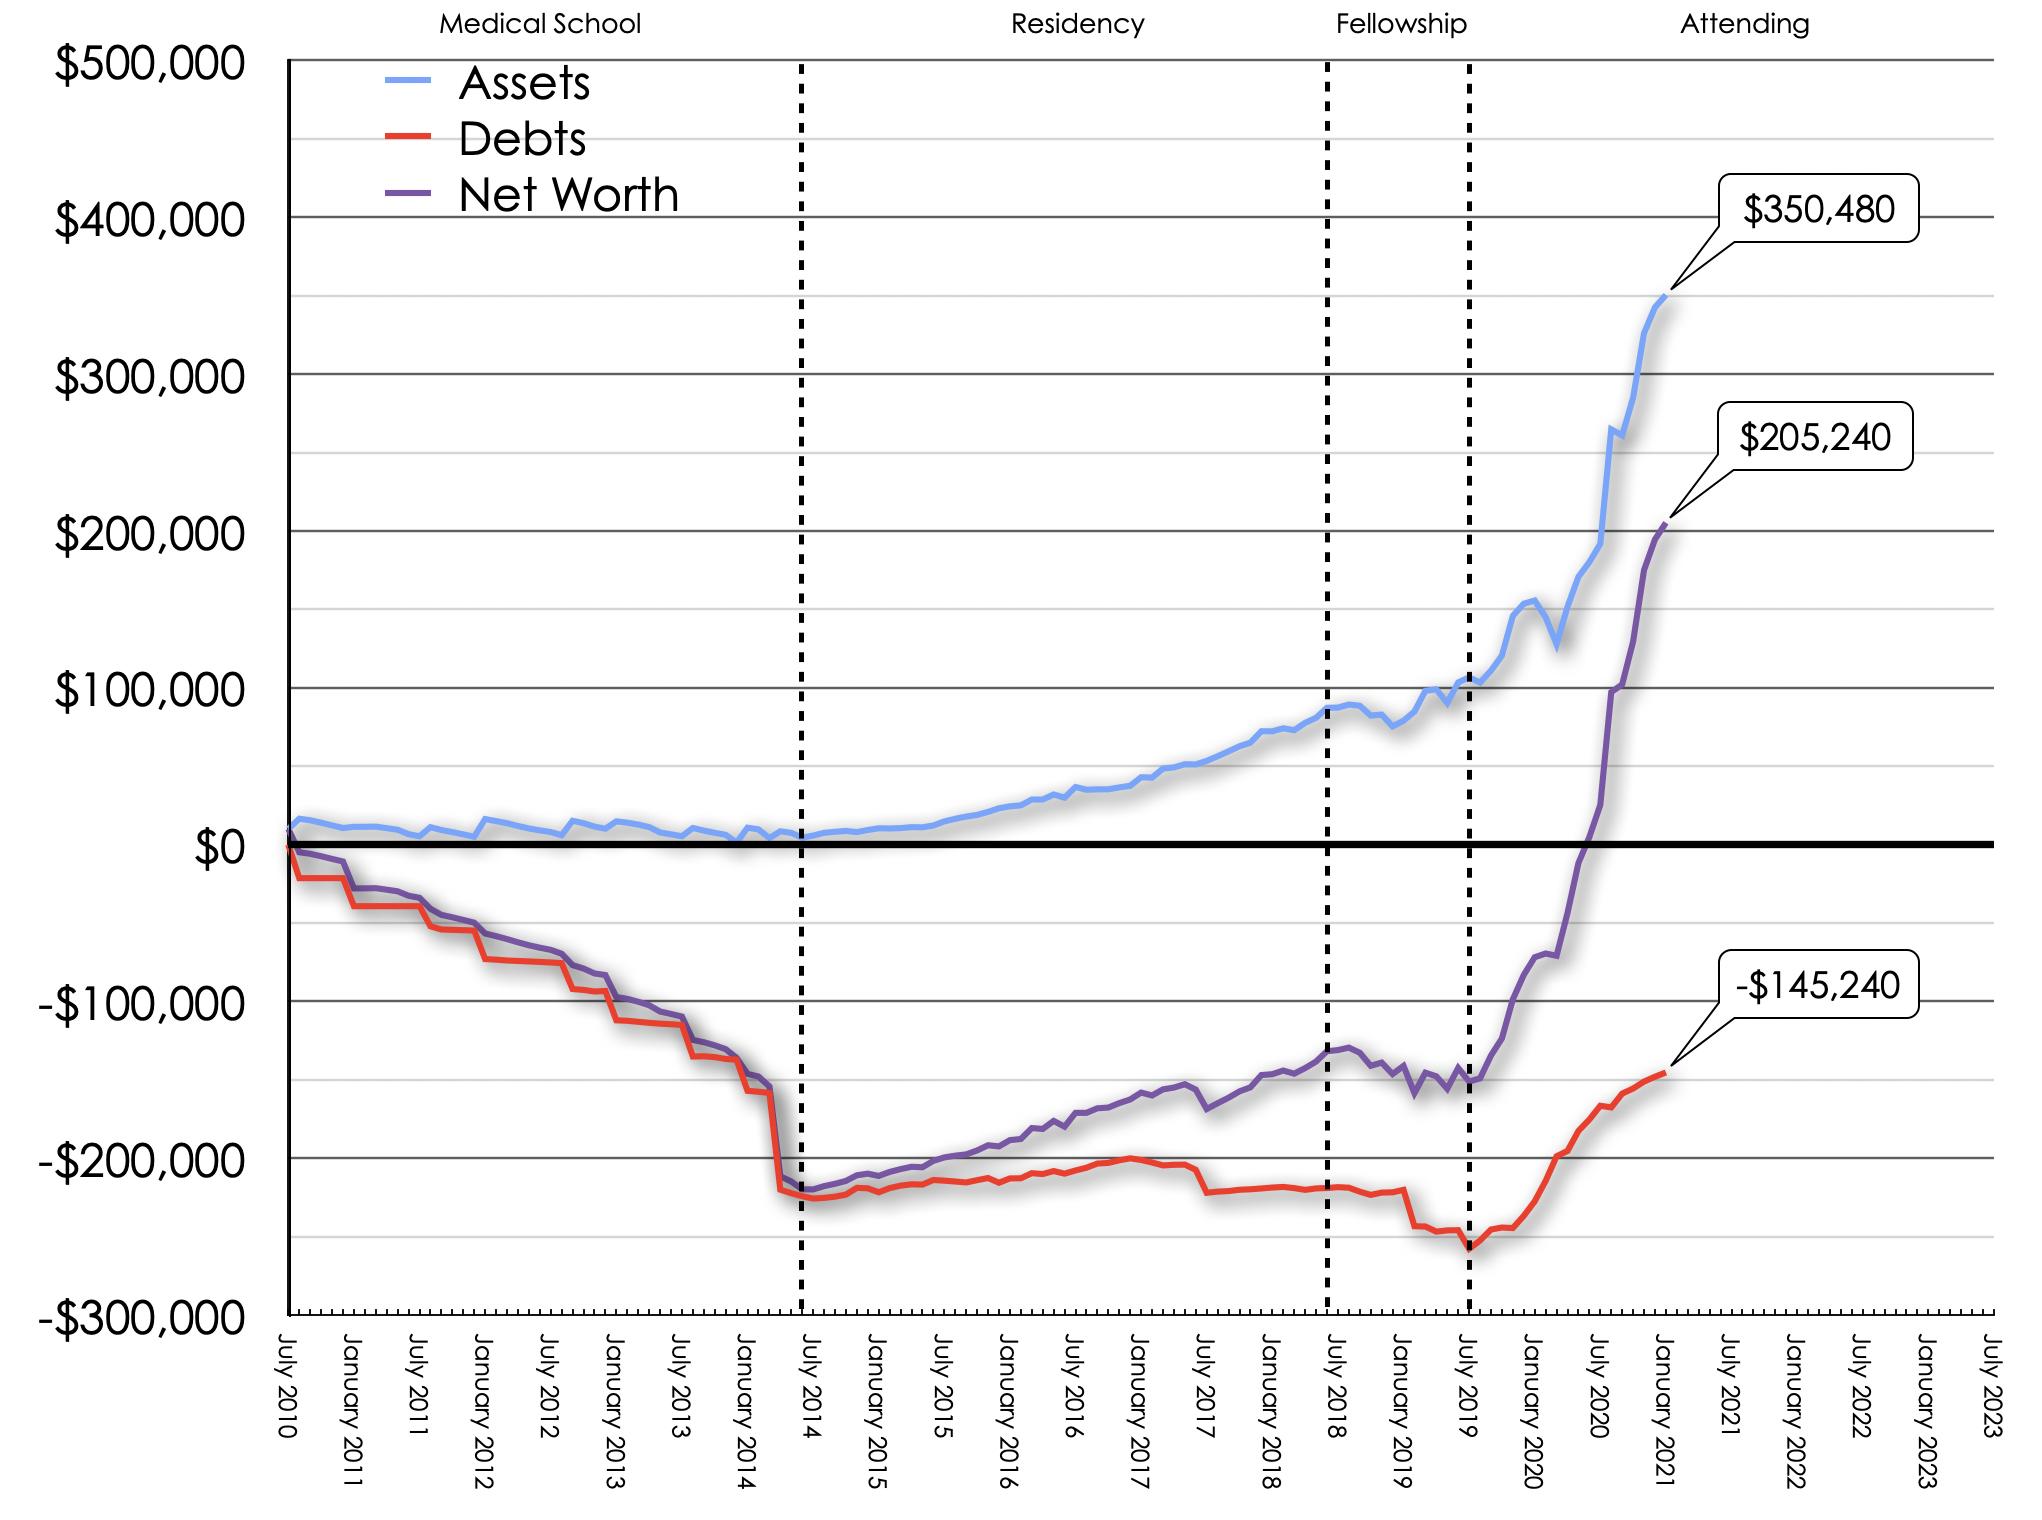 January 2021 Net Worth Trend